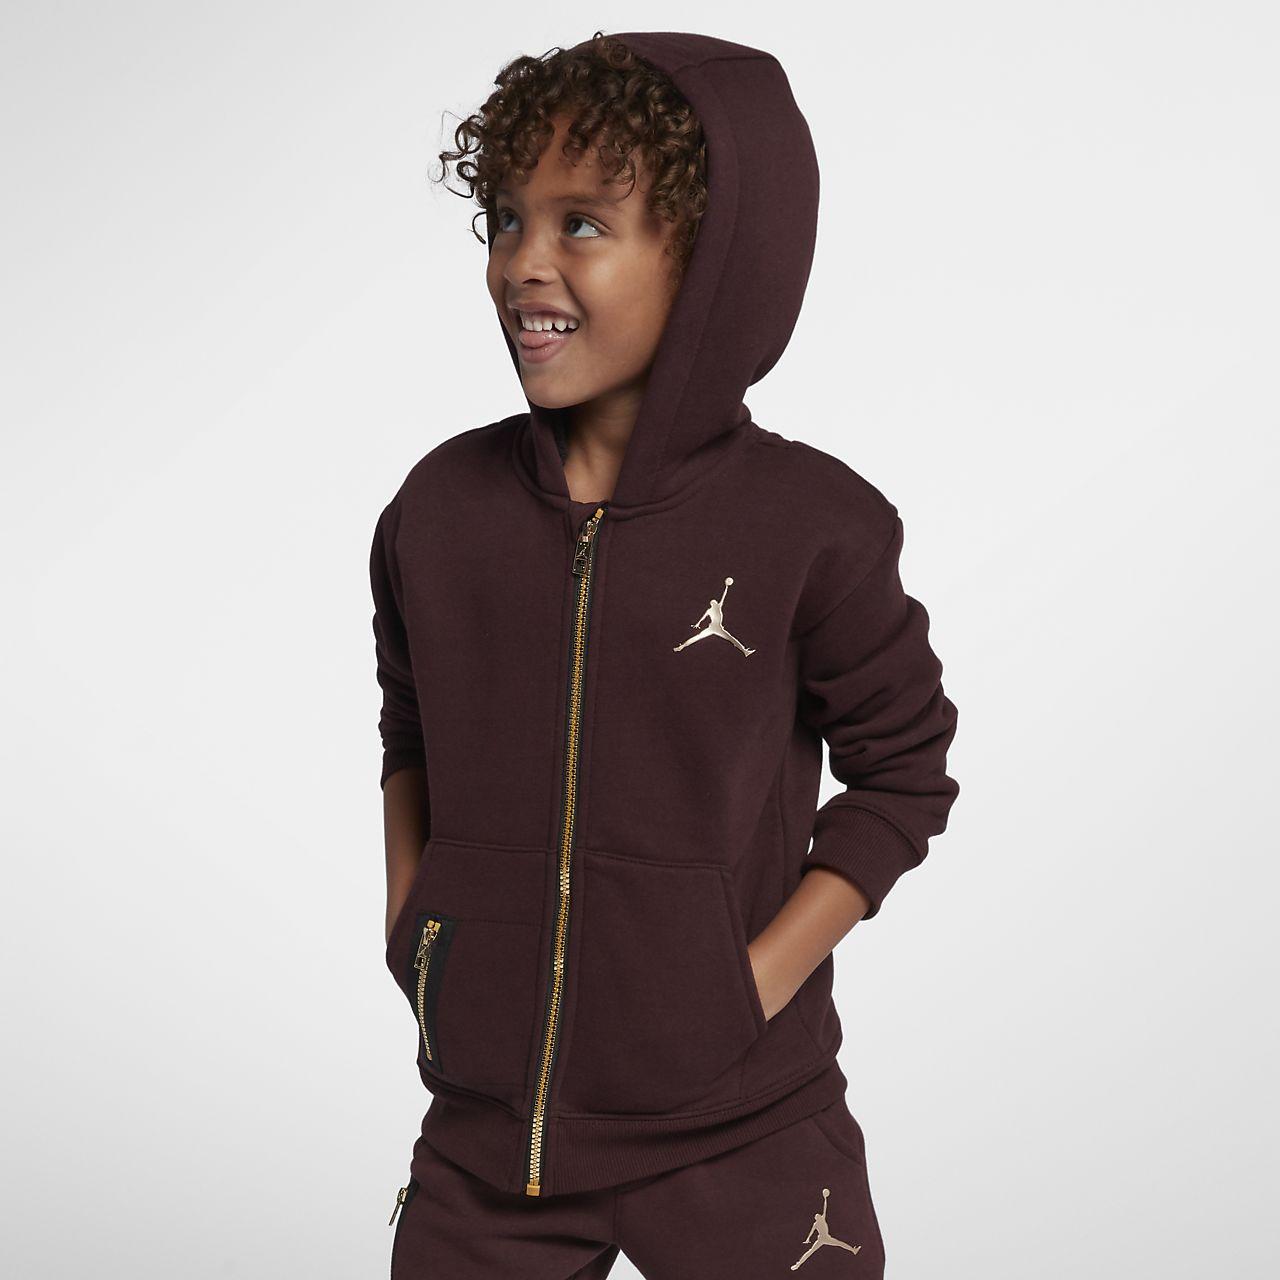 Jordan Sudadera con capucha con cremallera completa - Niño/a pequeño/a